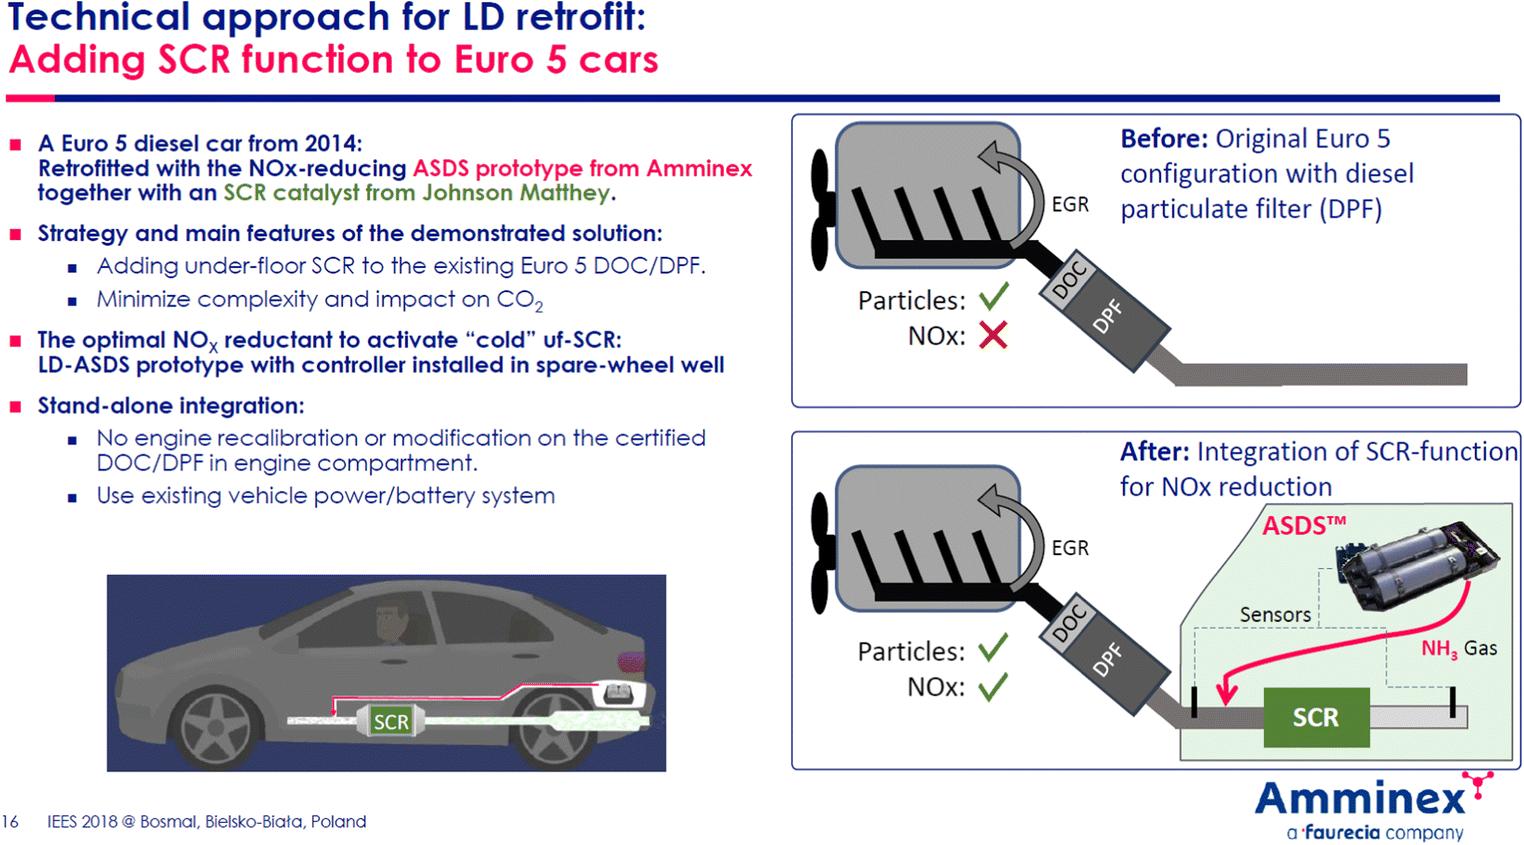 Trends in Automotive Emission Legislation: Impact on LD